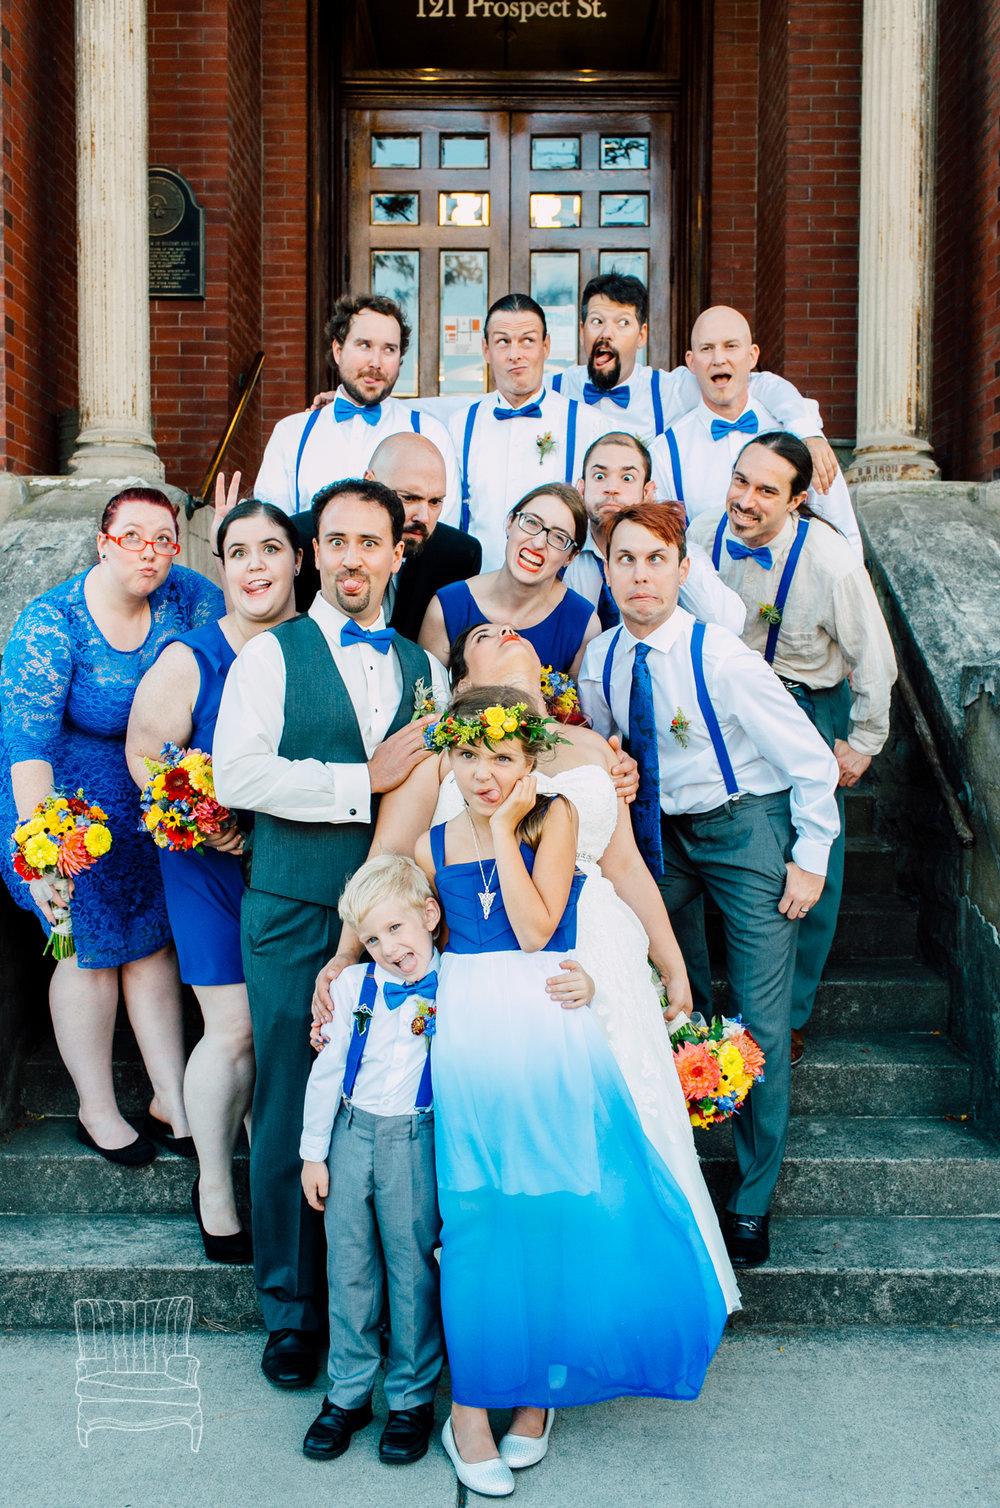 whatcom-museum-wedding-bribran-katheryn-moran-4.jpg